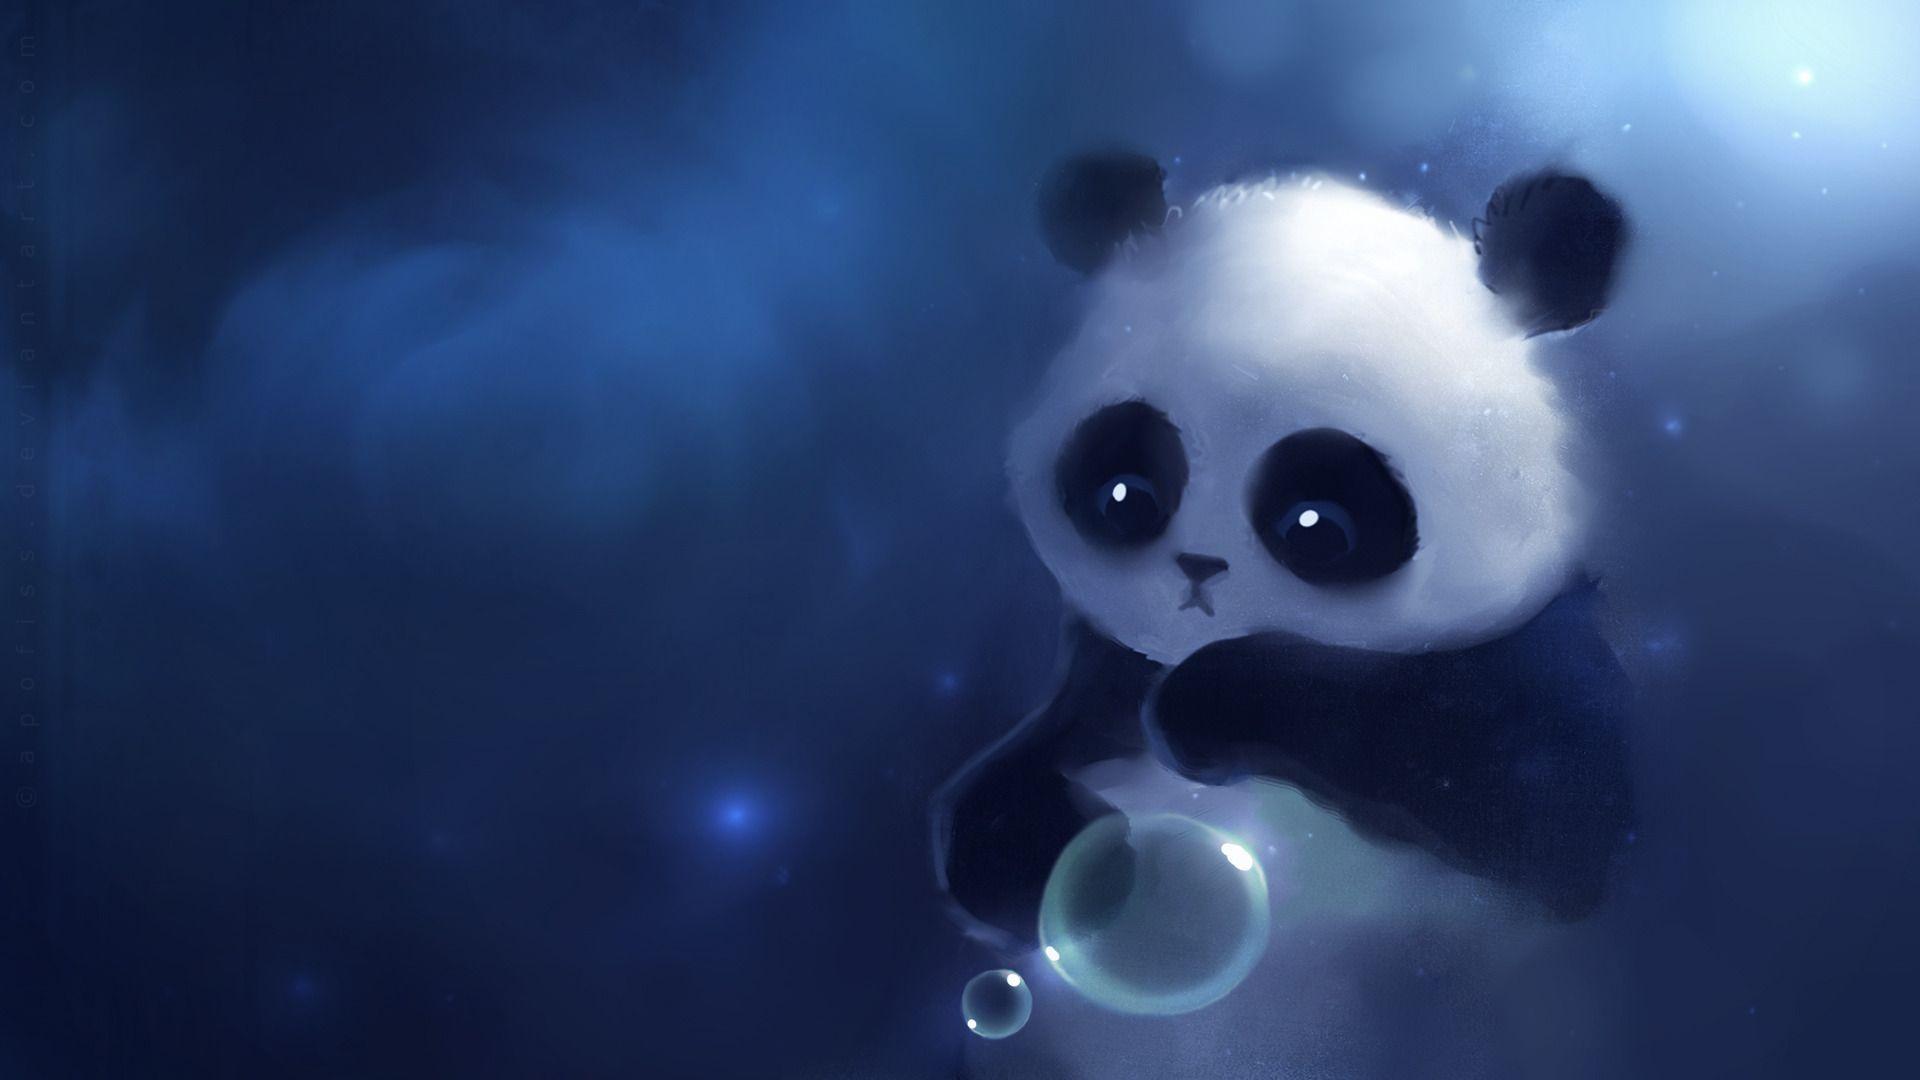 Res: 1920x1080, Cute Panda Backgrounds Xpx High Definition Desktop 1920x1200px HD .